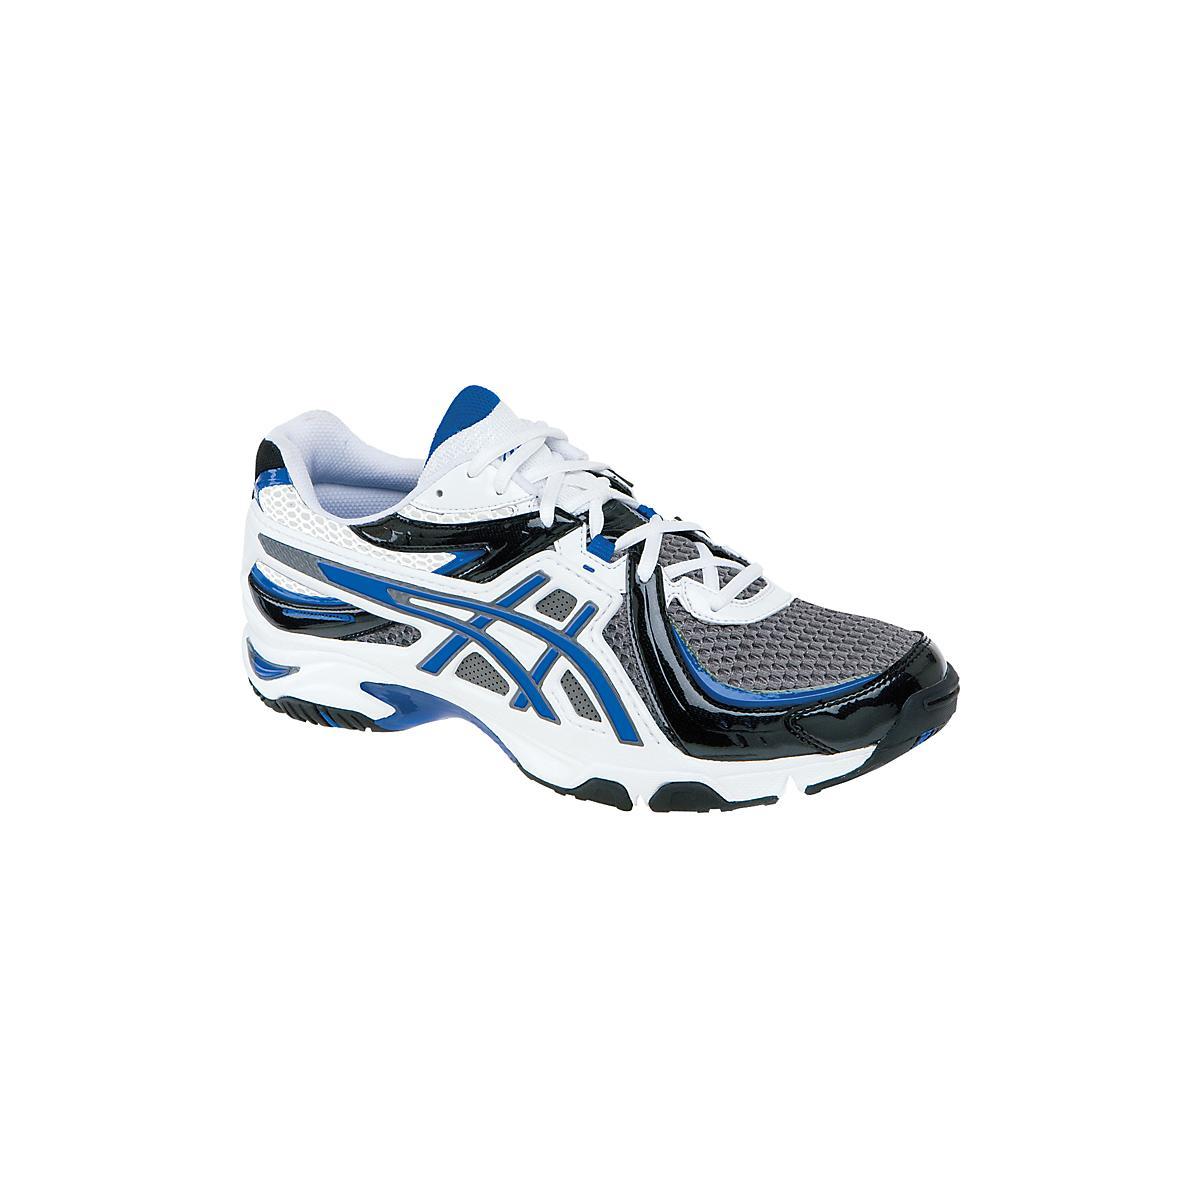 19da1634ab99 Mens ASICS GEL-Uptempo Running Shoe at Road Runner Sports